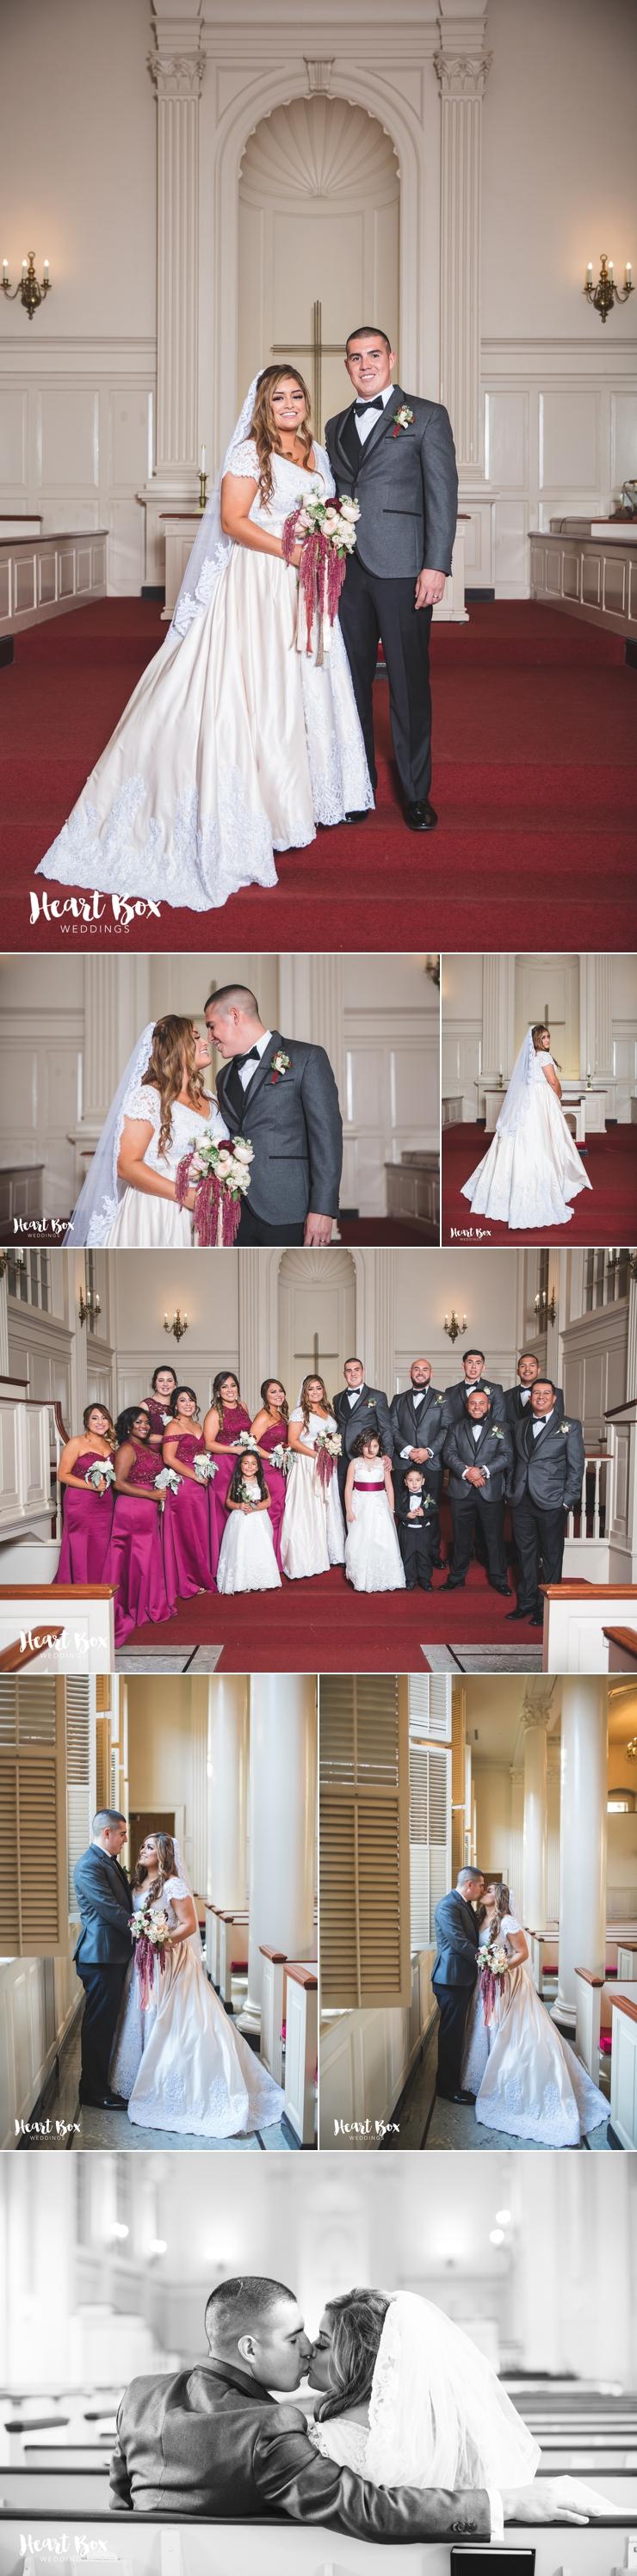 Montero Wedding BC 10.jpg